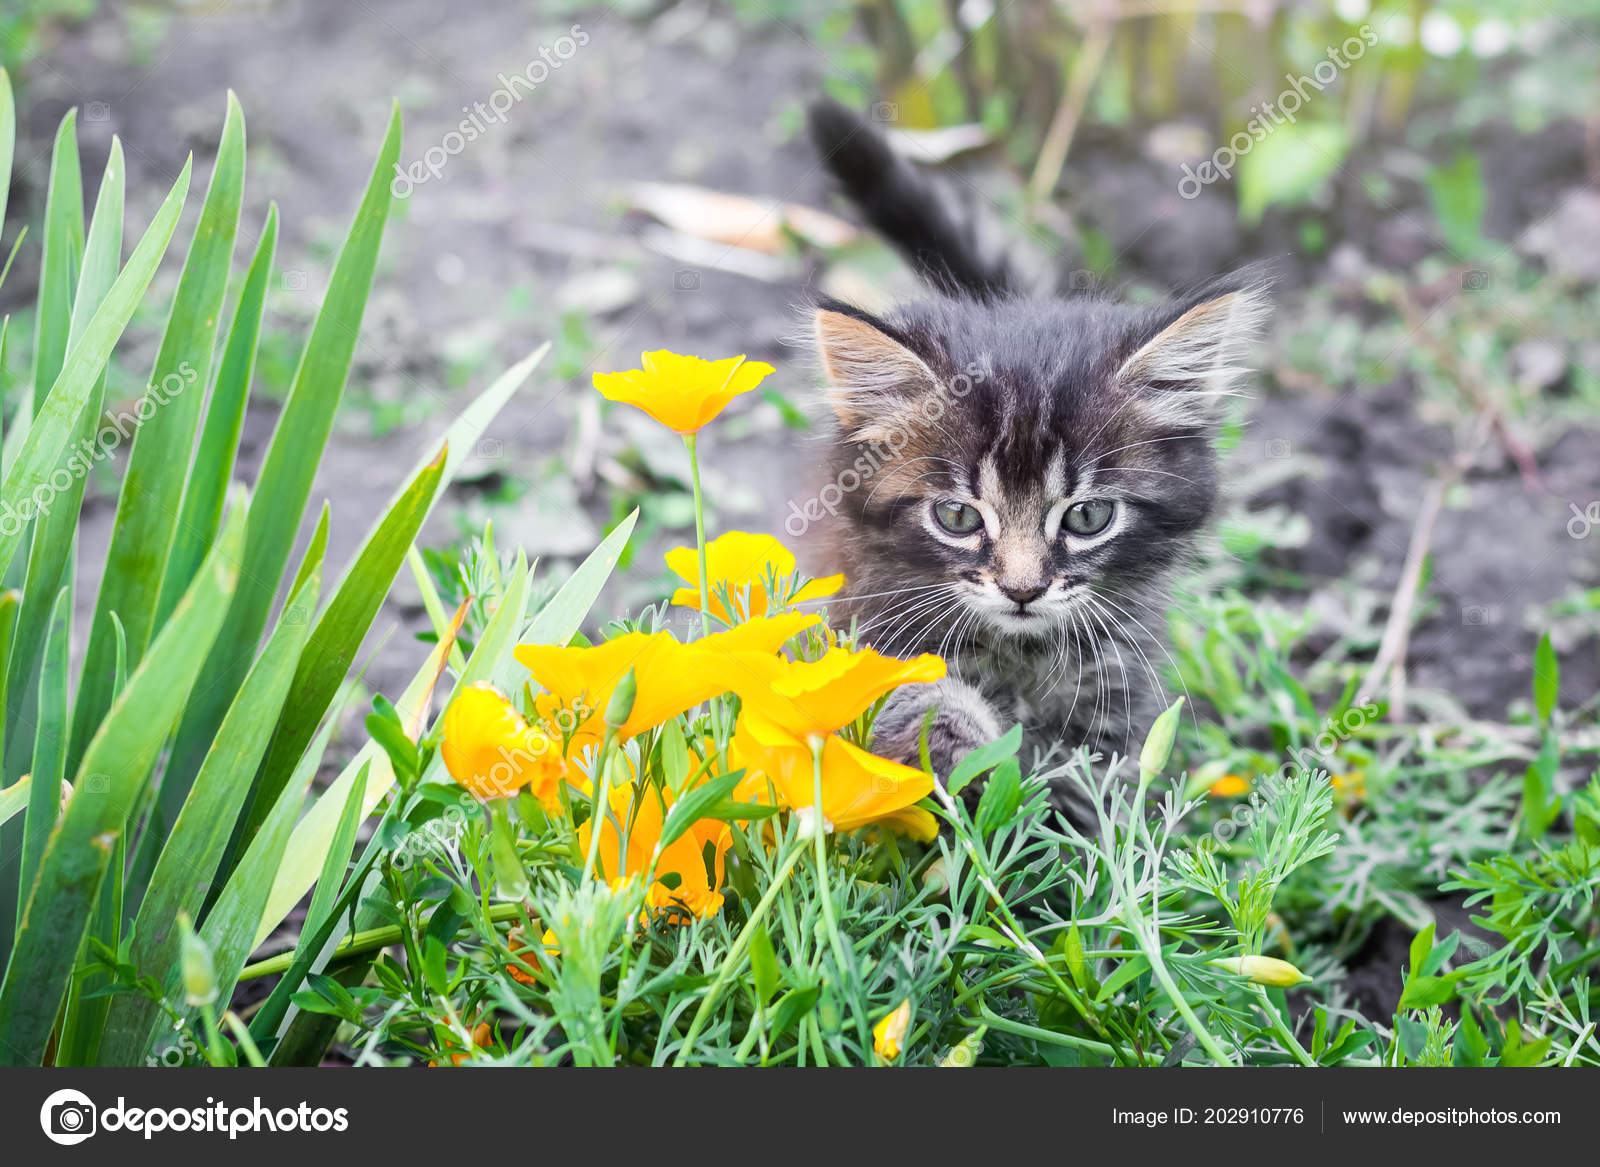 Little Kitten Garden Yellow Flowers Little Kitten Nature Goes Owner